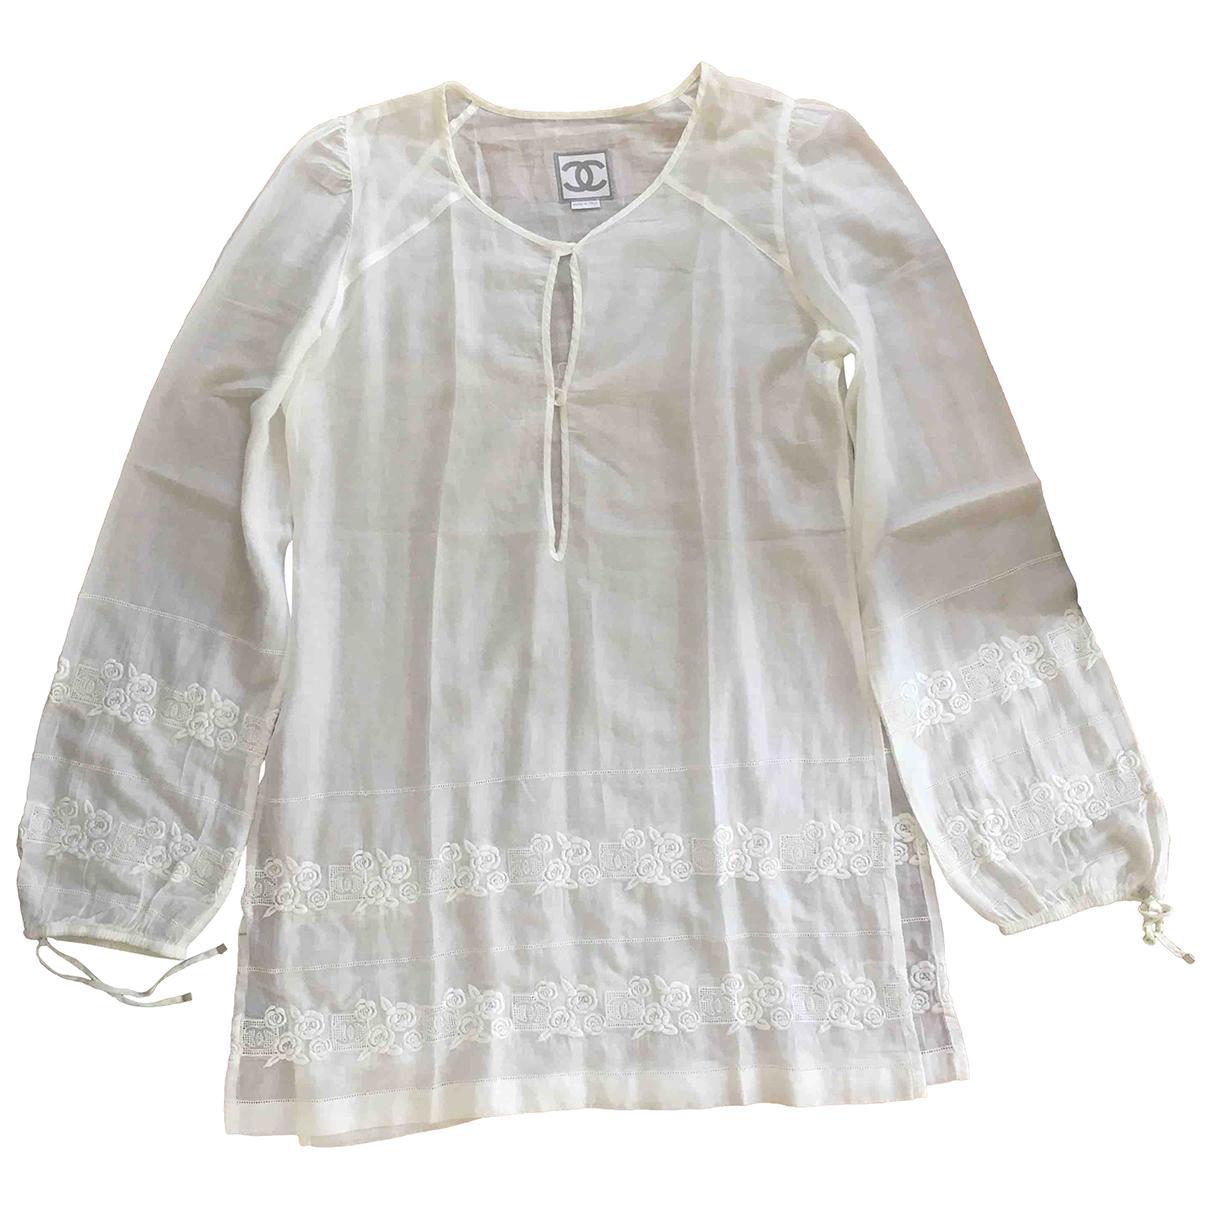 Chanel \N White Cotton dress for Women 46 FR